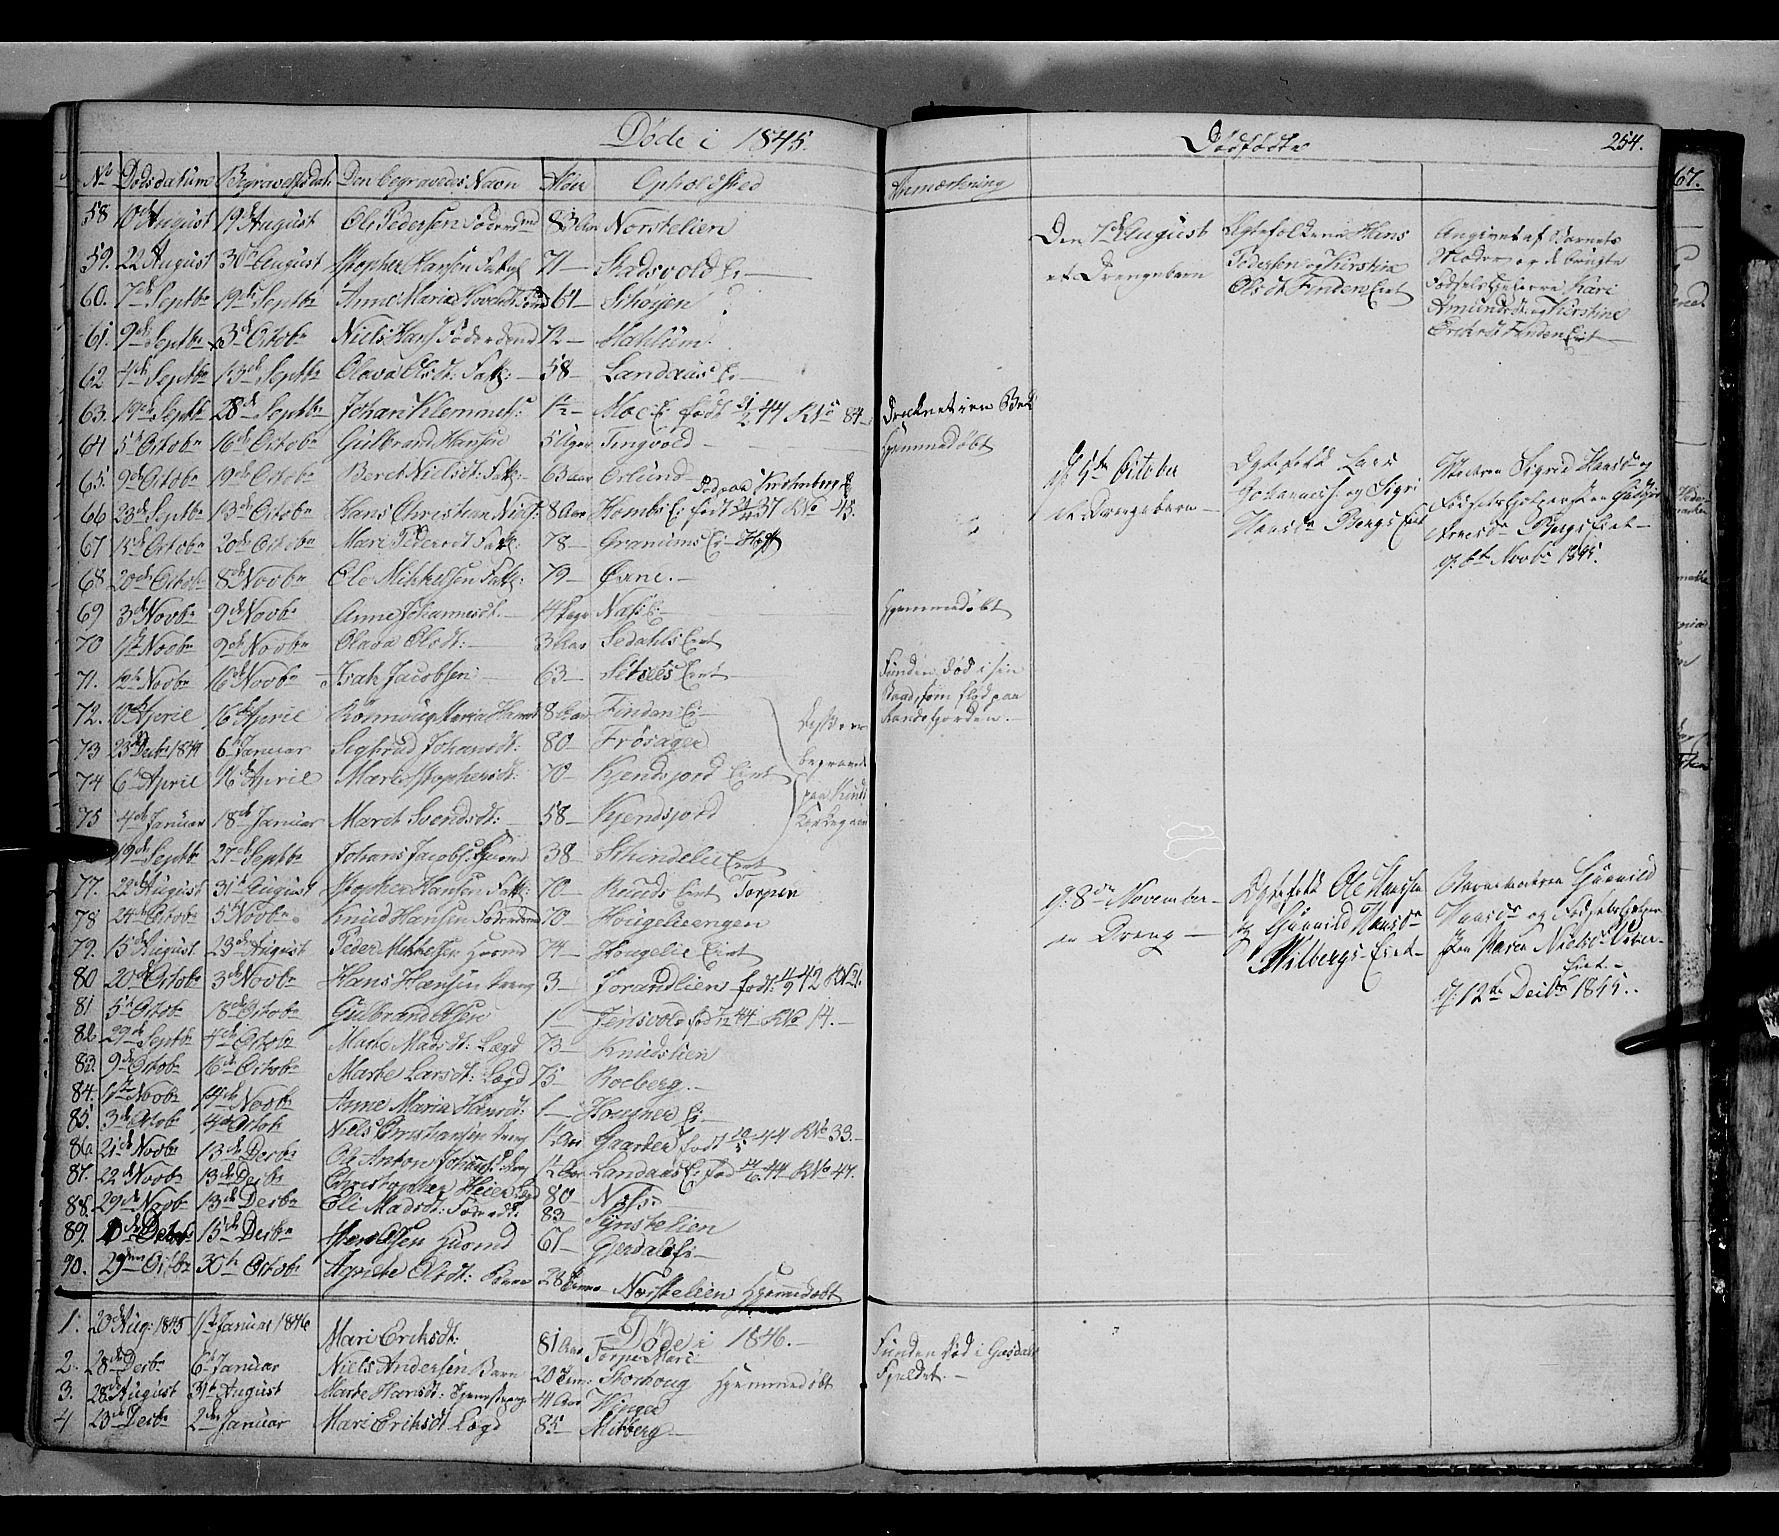 SAH, Land prestekontor, Klokkerbok nr. 2, 1833-1849, s. 254